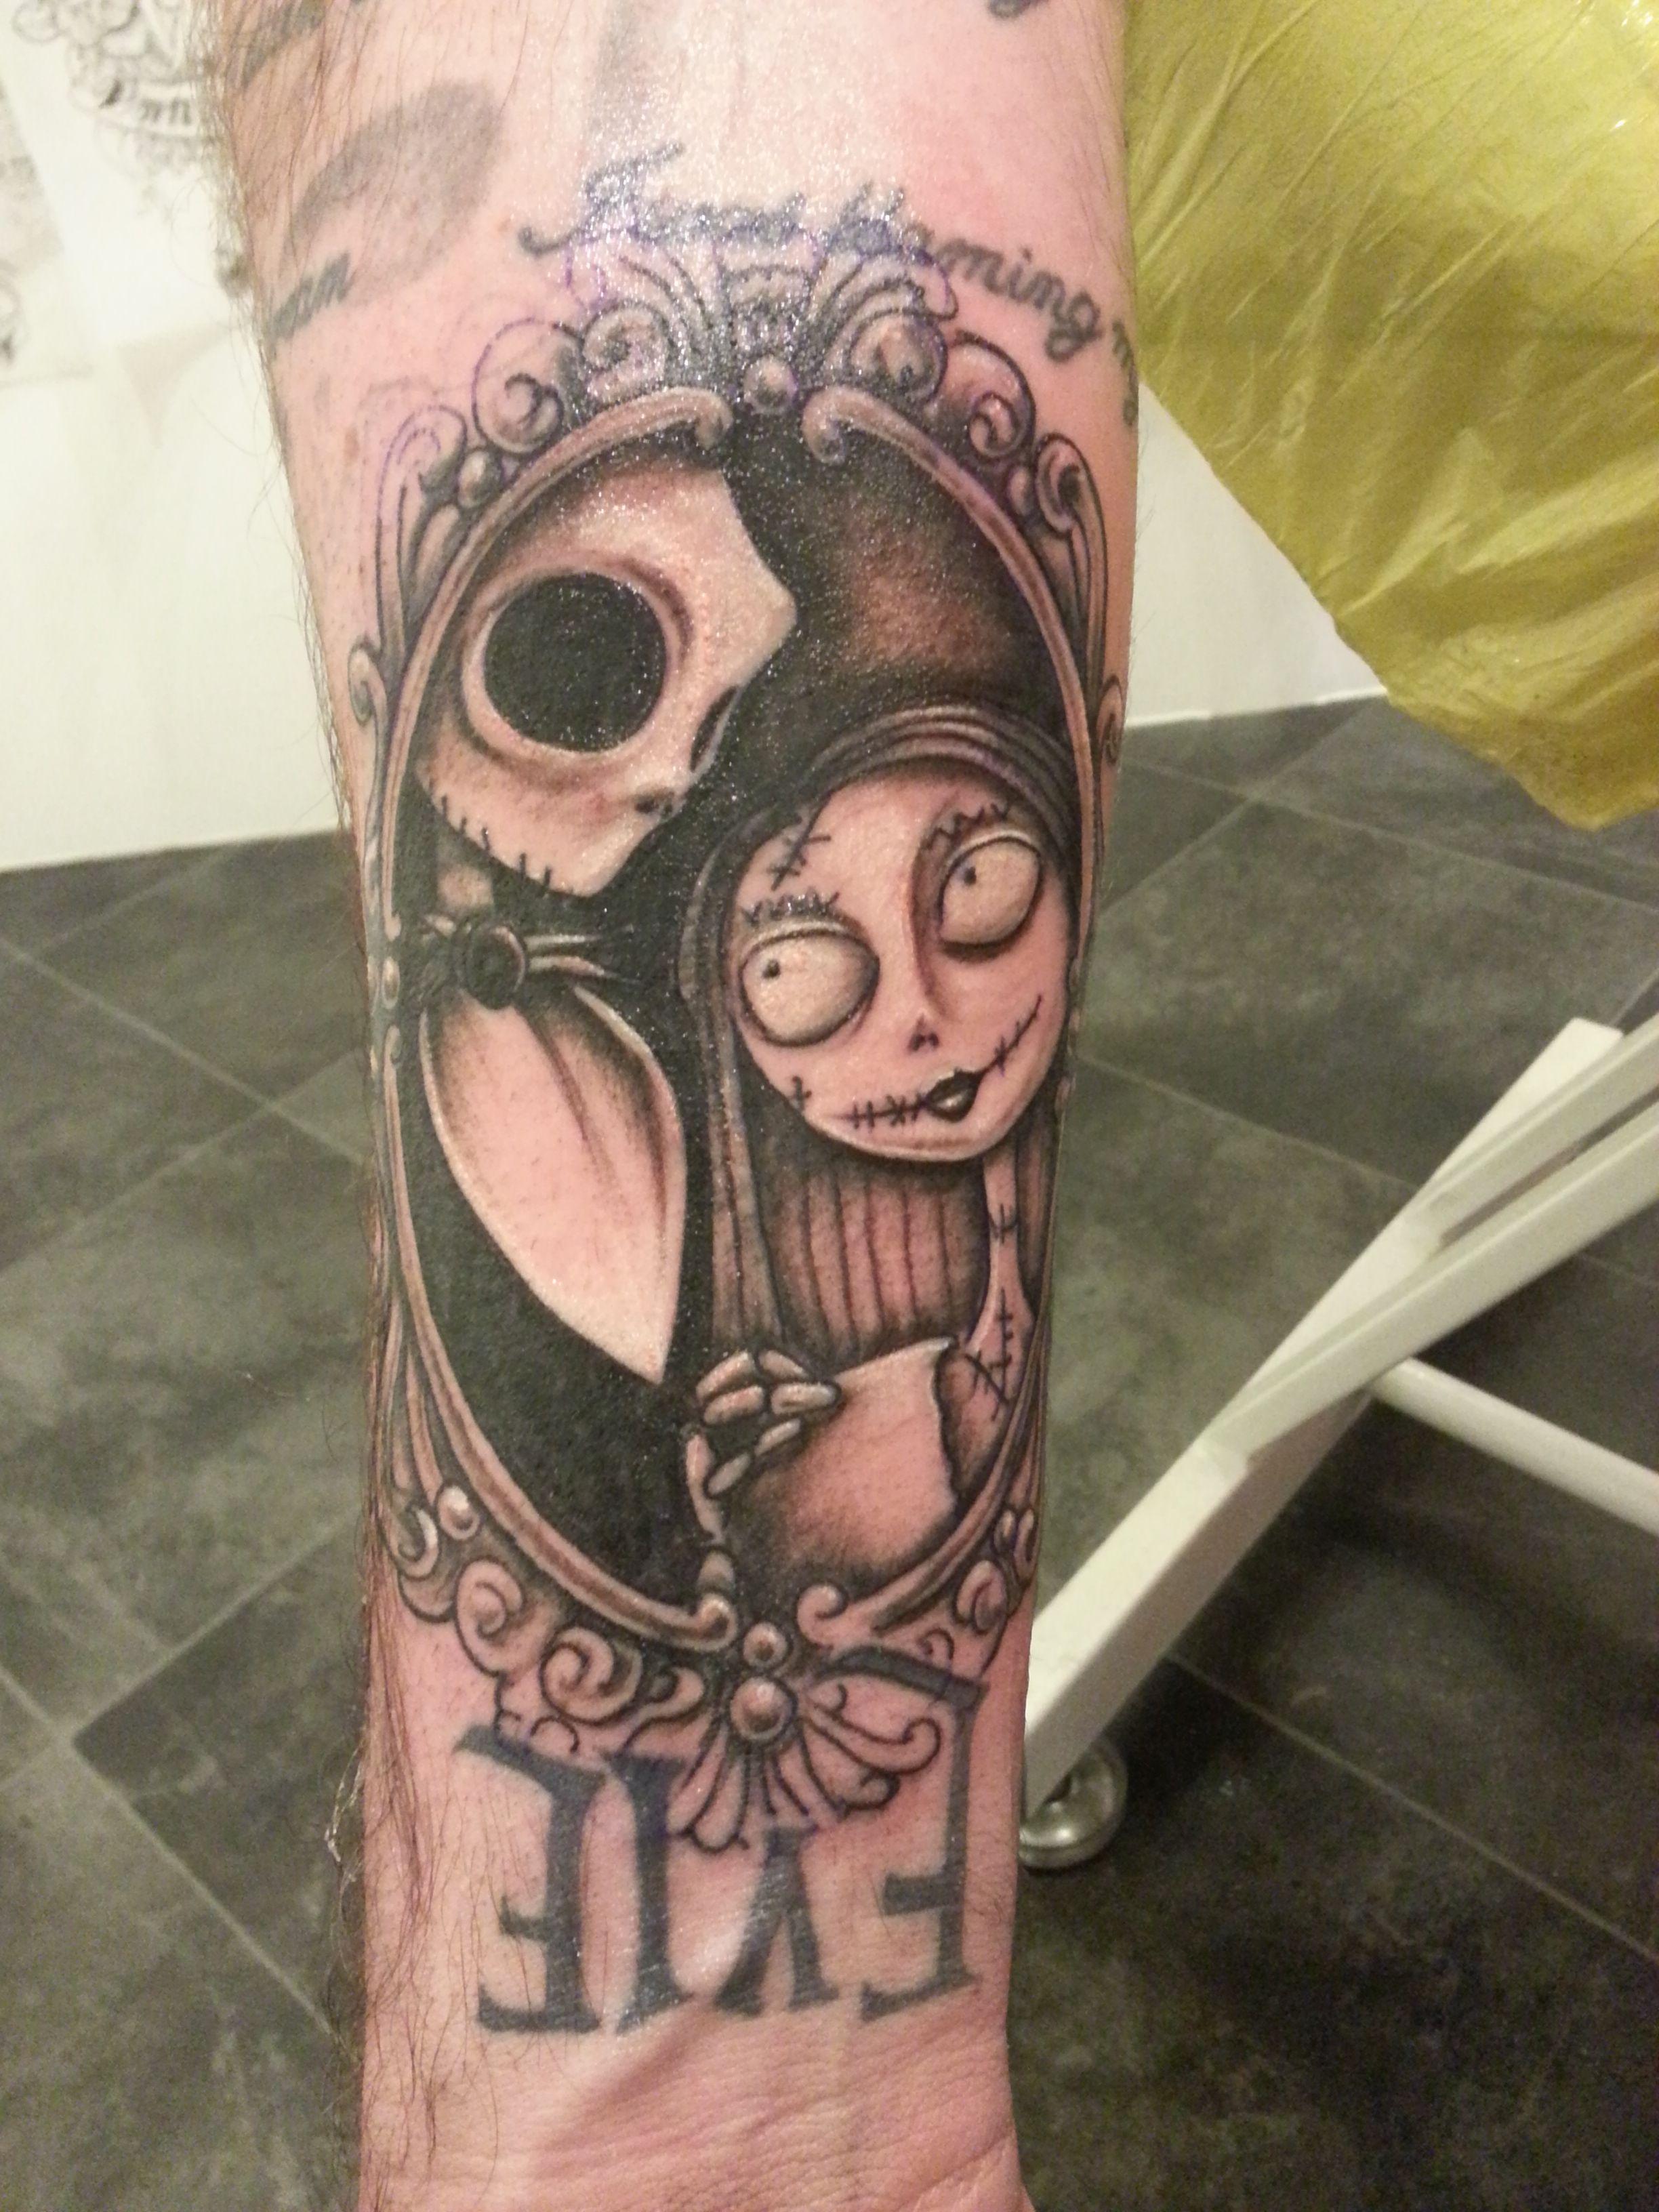 nightmare before christmas tattoo | Tattoo | Pinterest | Nightmare ...